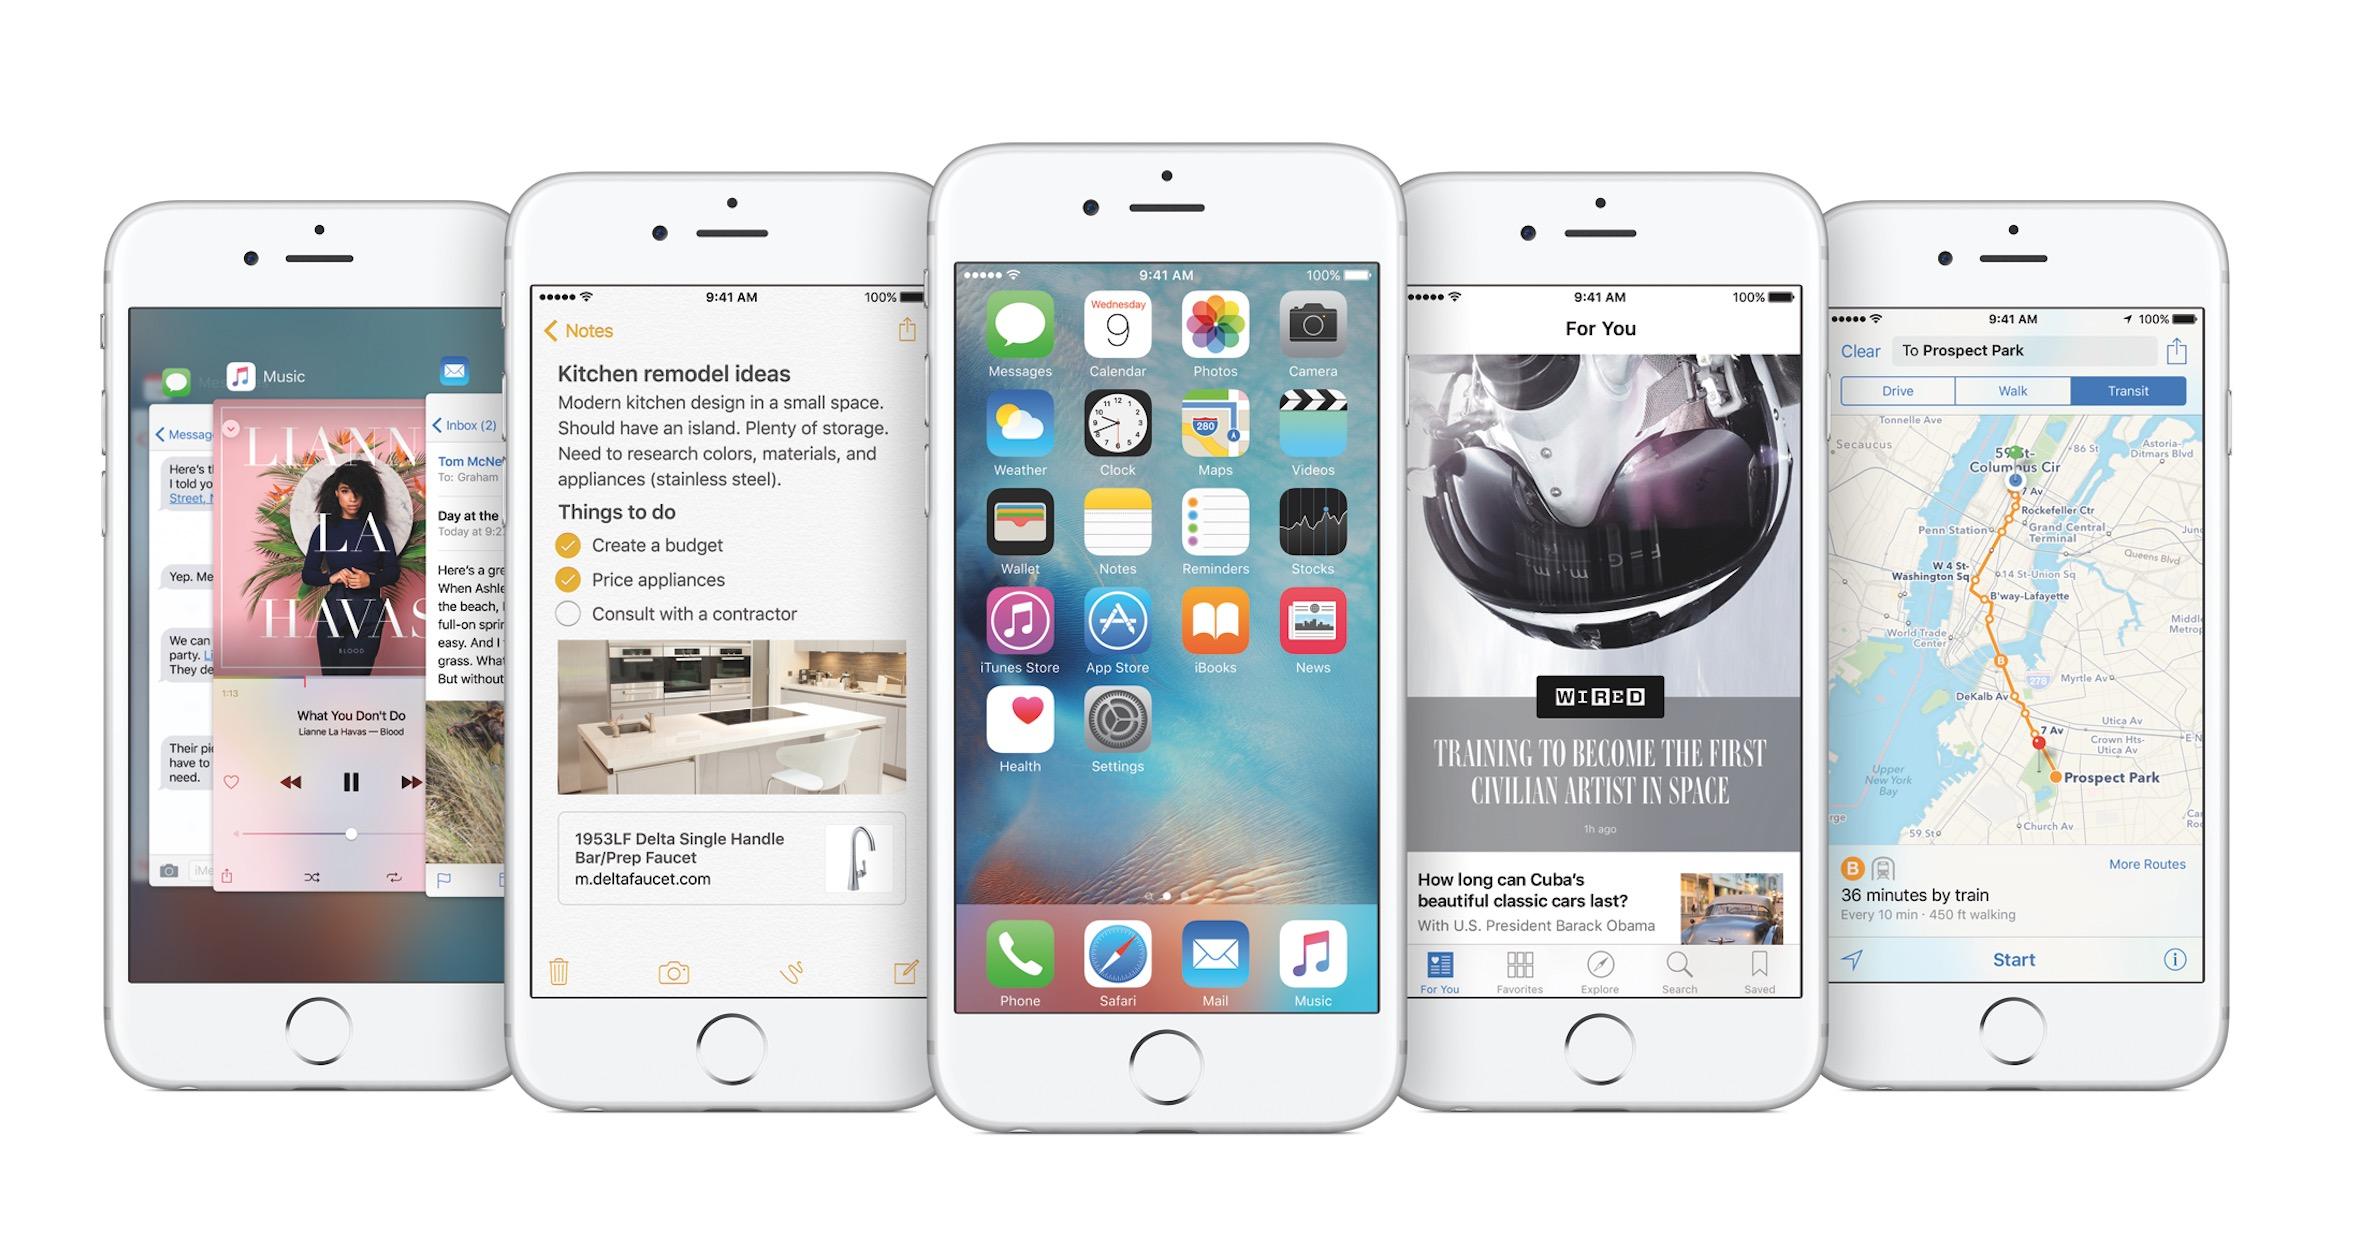 Apple、デベロッパー向けに「iOS 9.2 beta 2」と「OS X El Capitan 10.11.2 beta 2」リリース